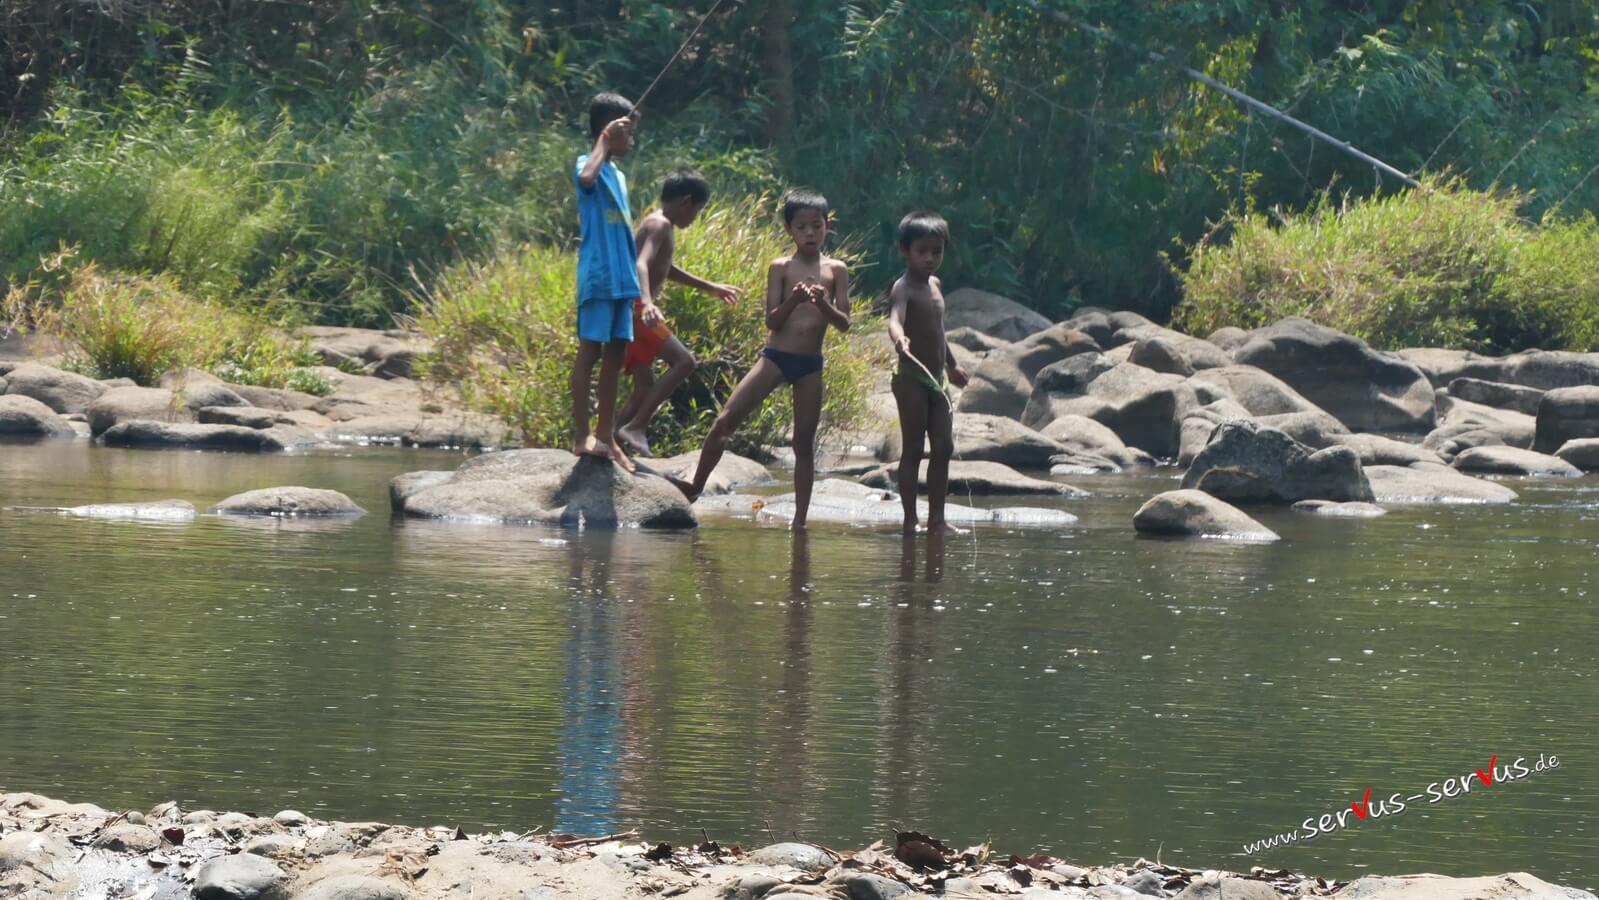 Tad Pasuam, Laos, Kinder beim angeln am Wasserfall